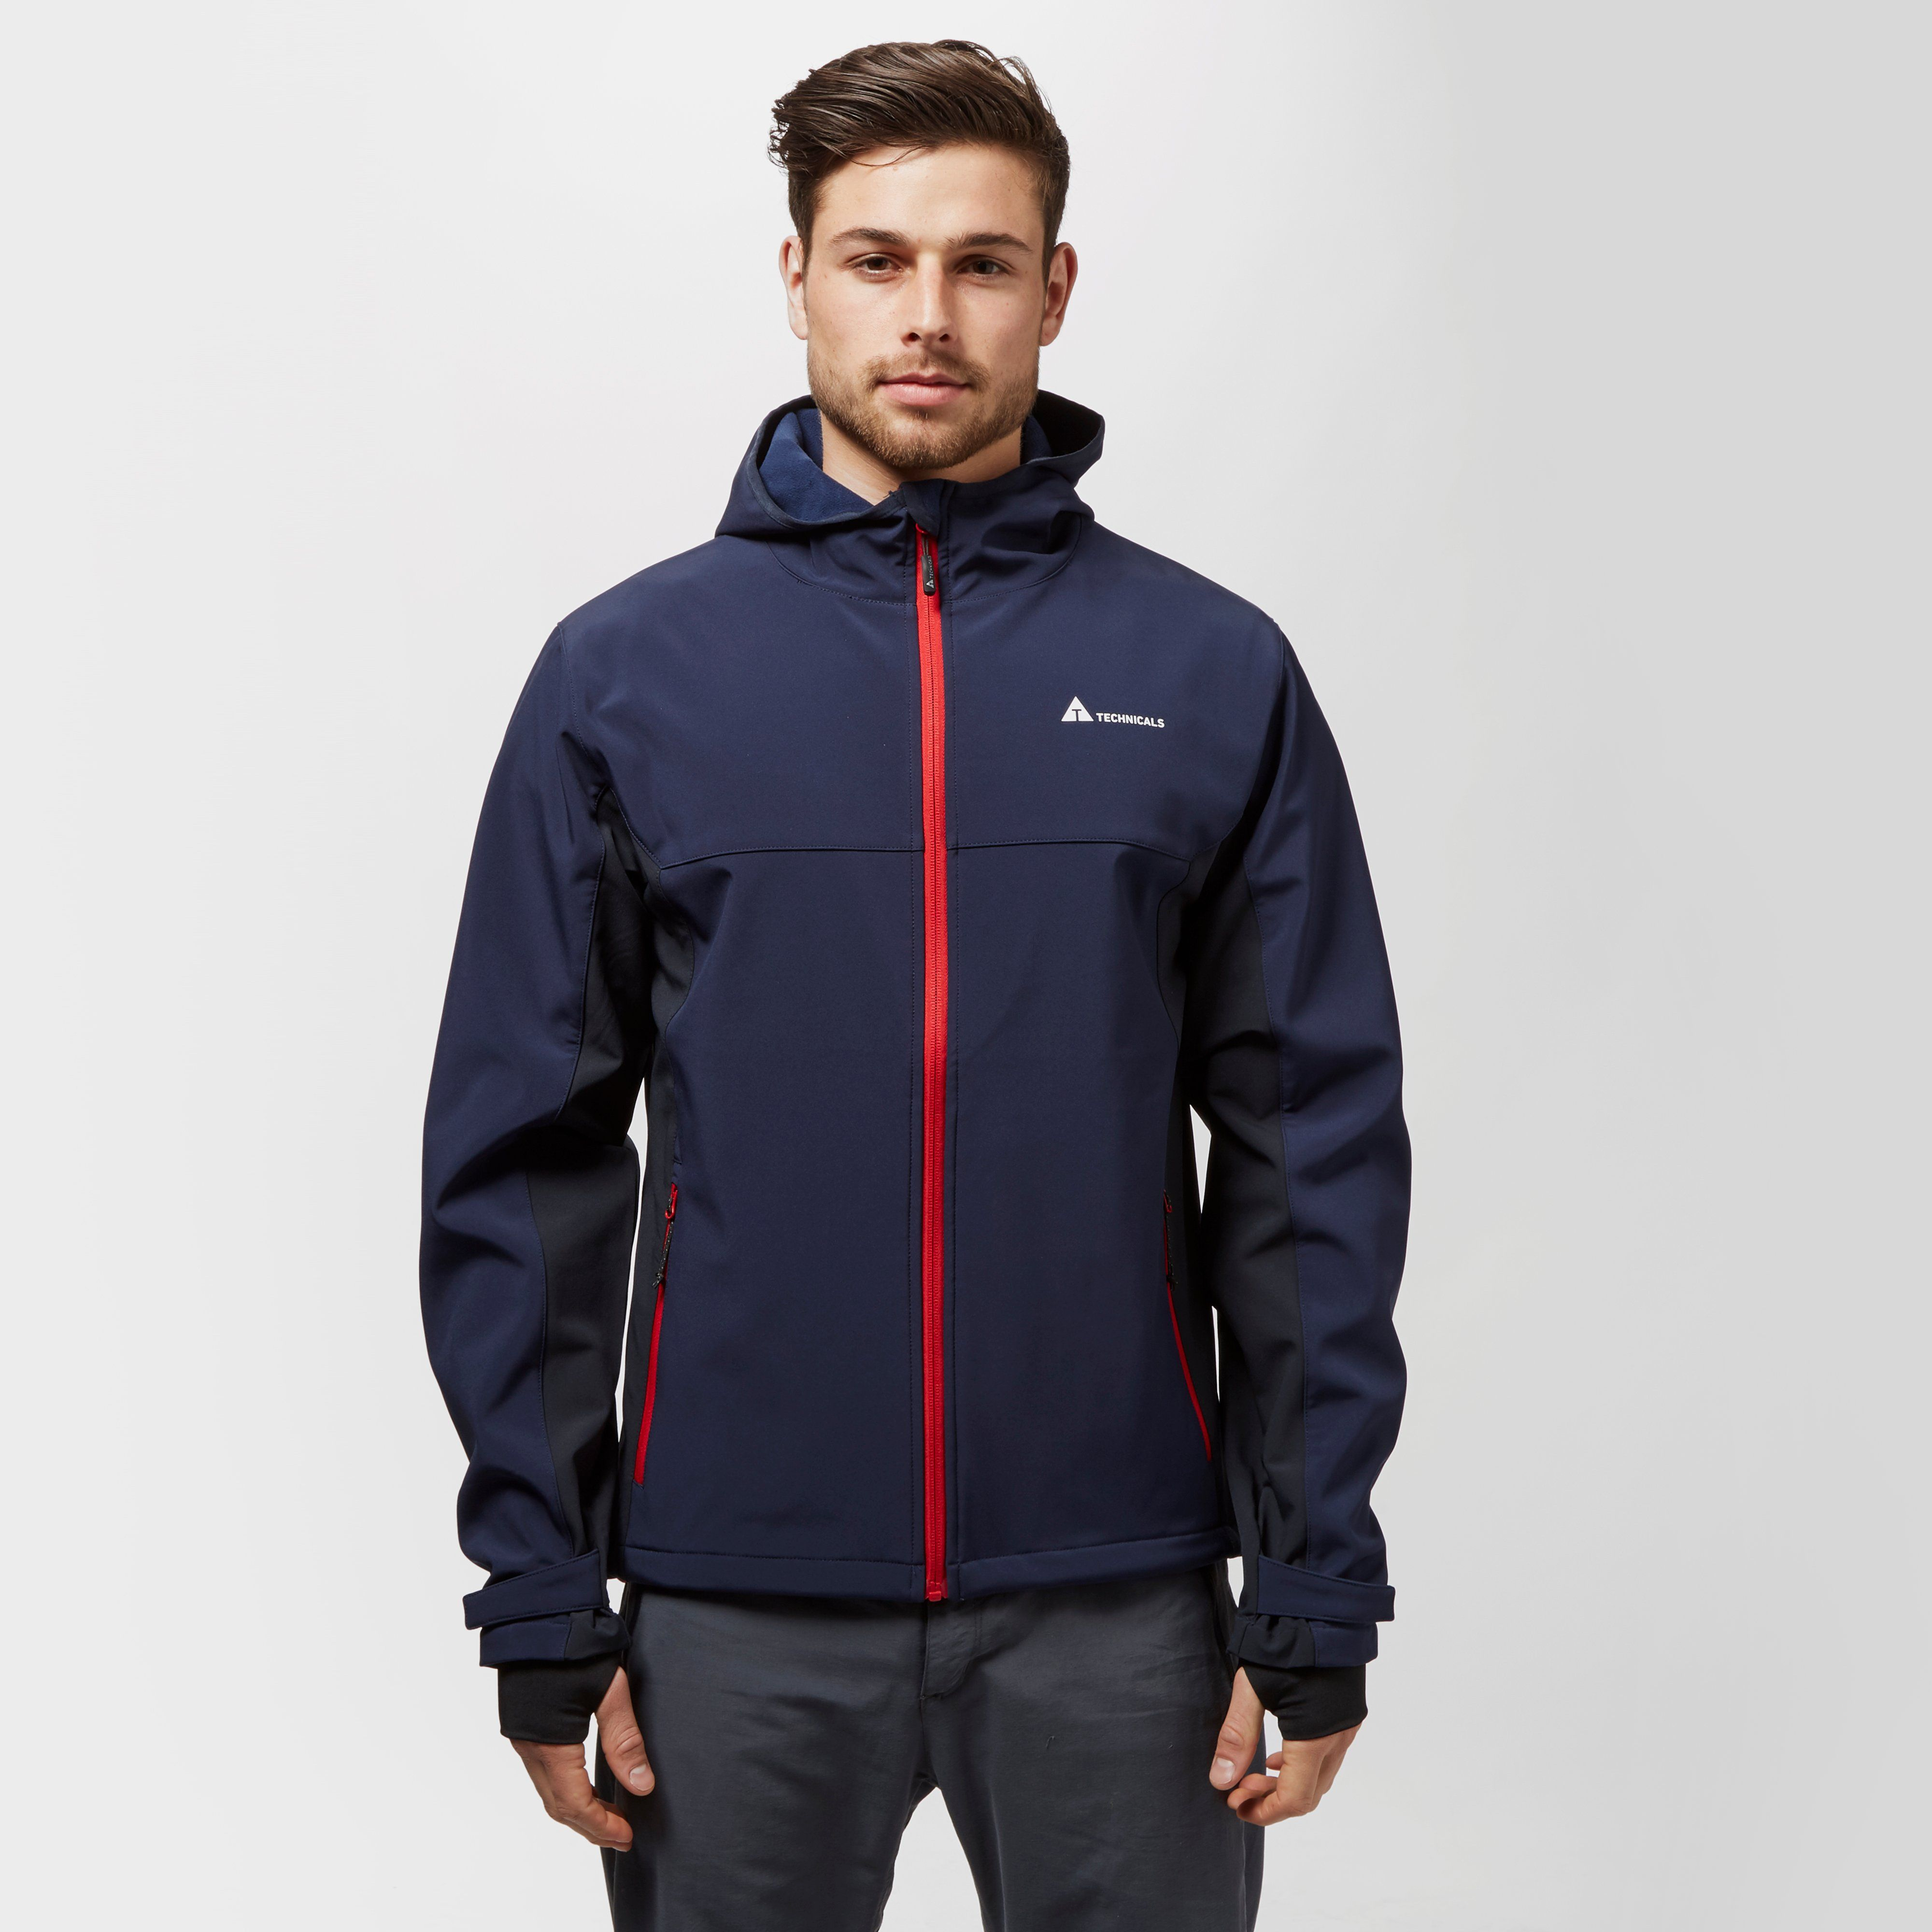 TECHNICALS Men's Speed Softshell Jacket